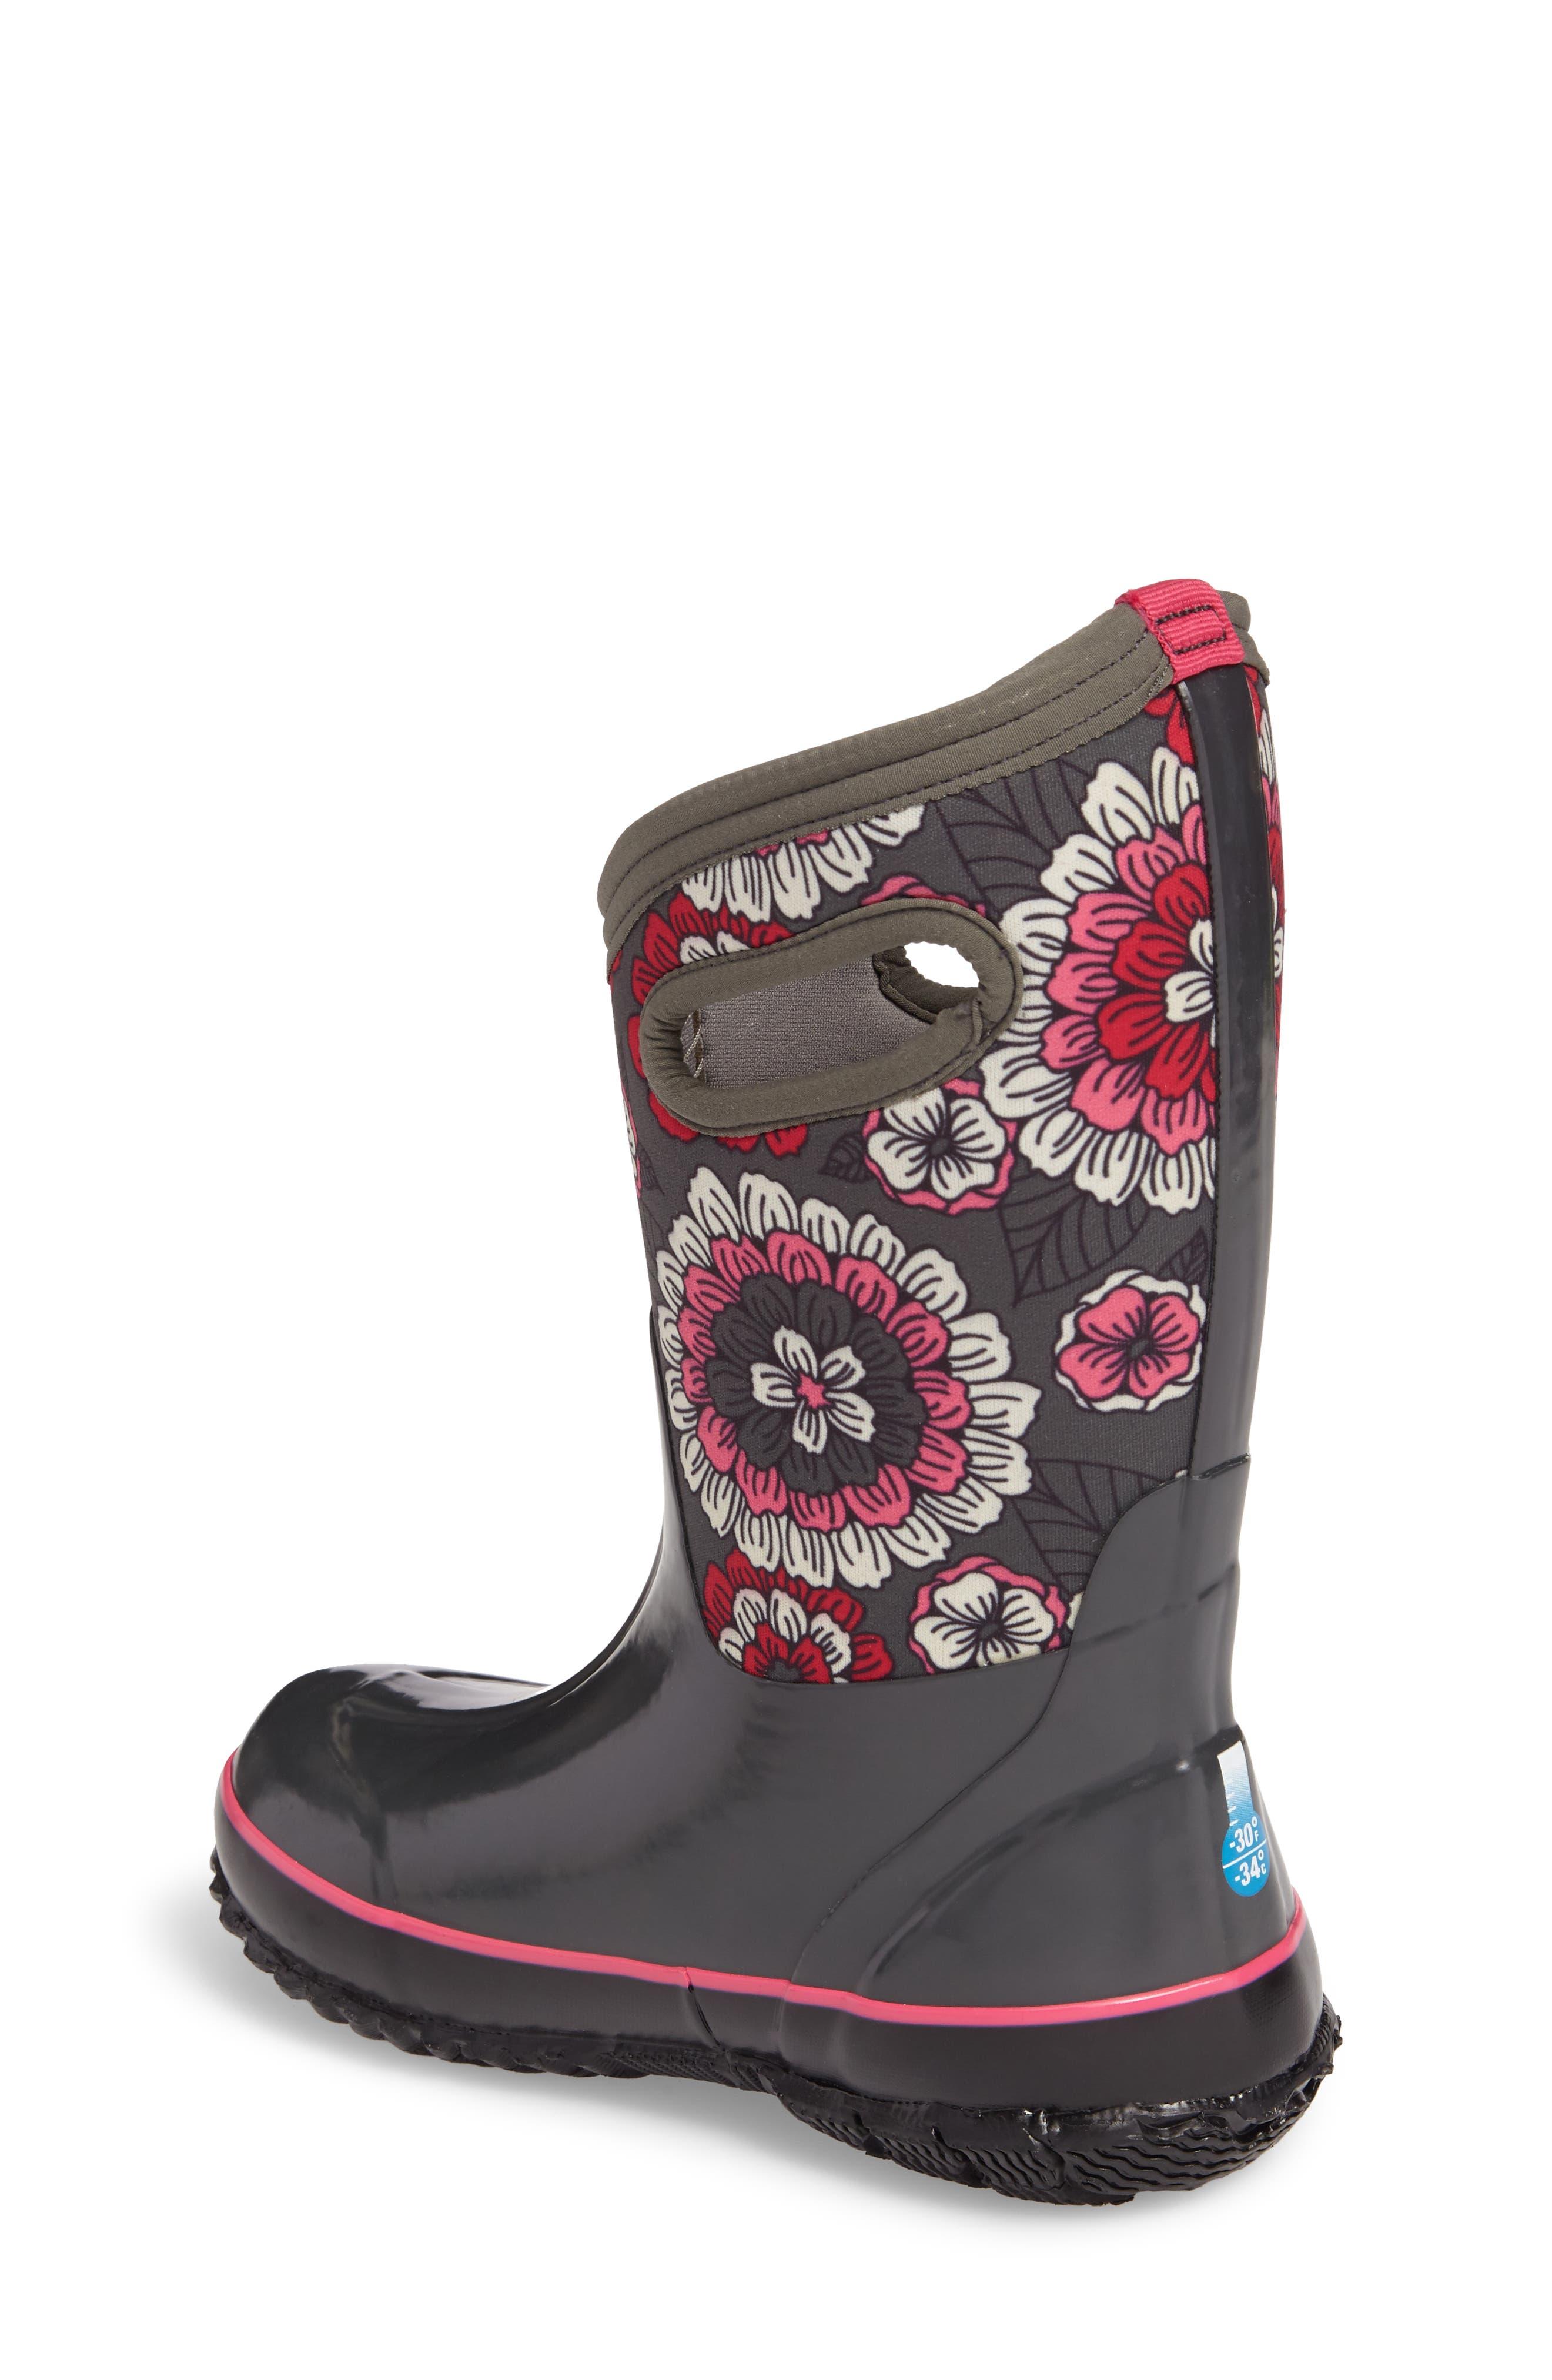 Classic Pansies Insulated Waterproof Boot,                             Alternate thumbnail 2, color,                             DARK GRAY MULTI